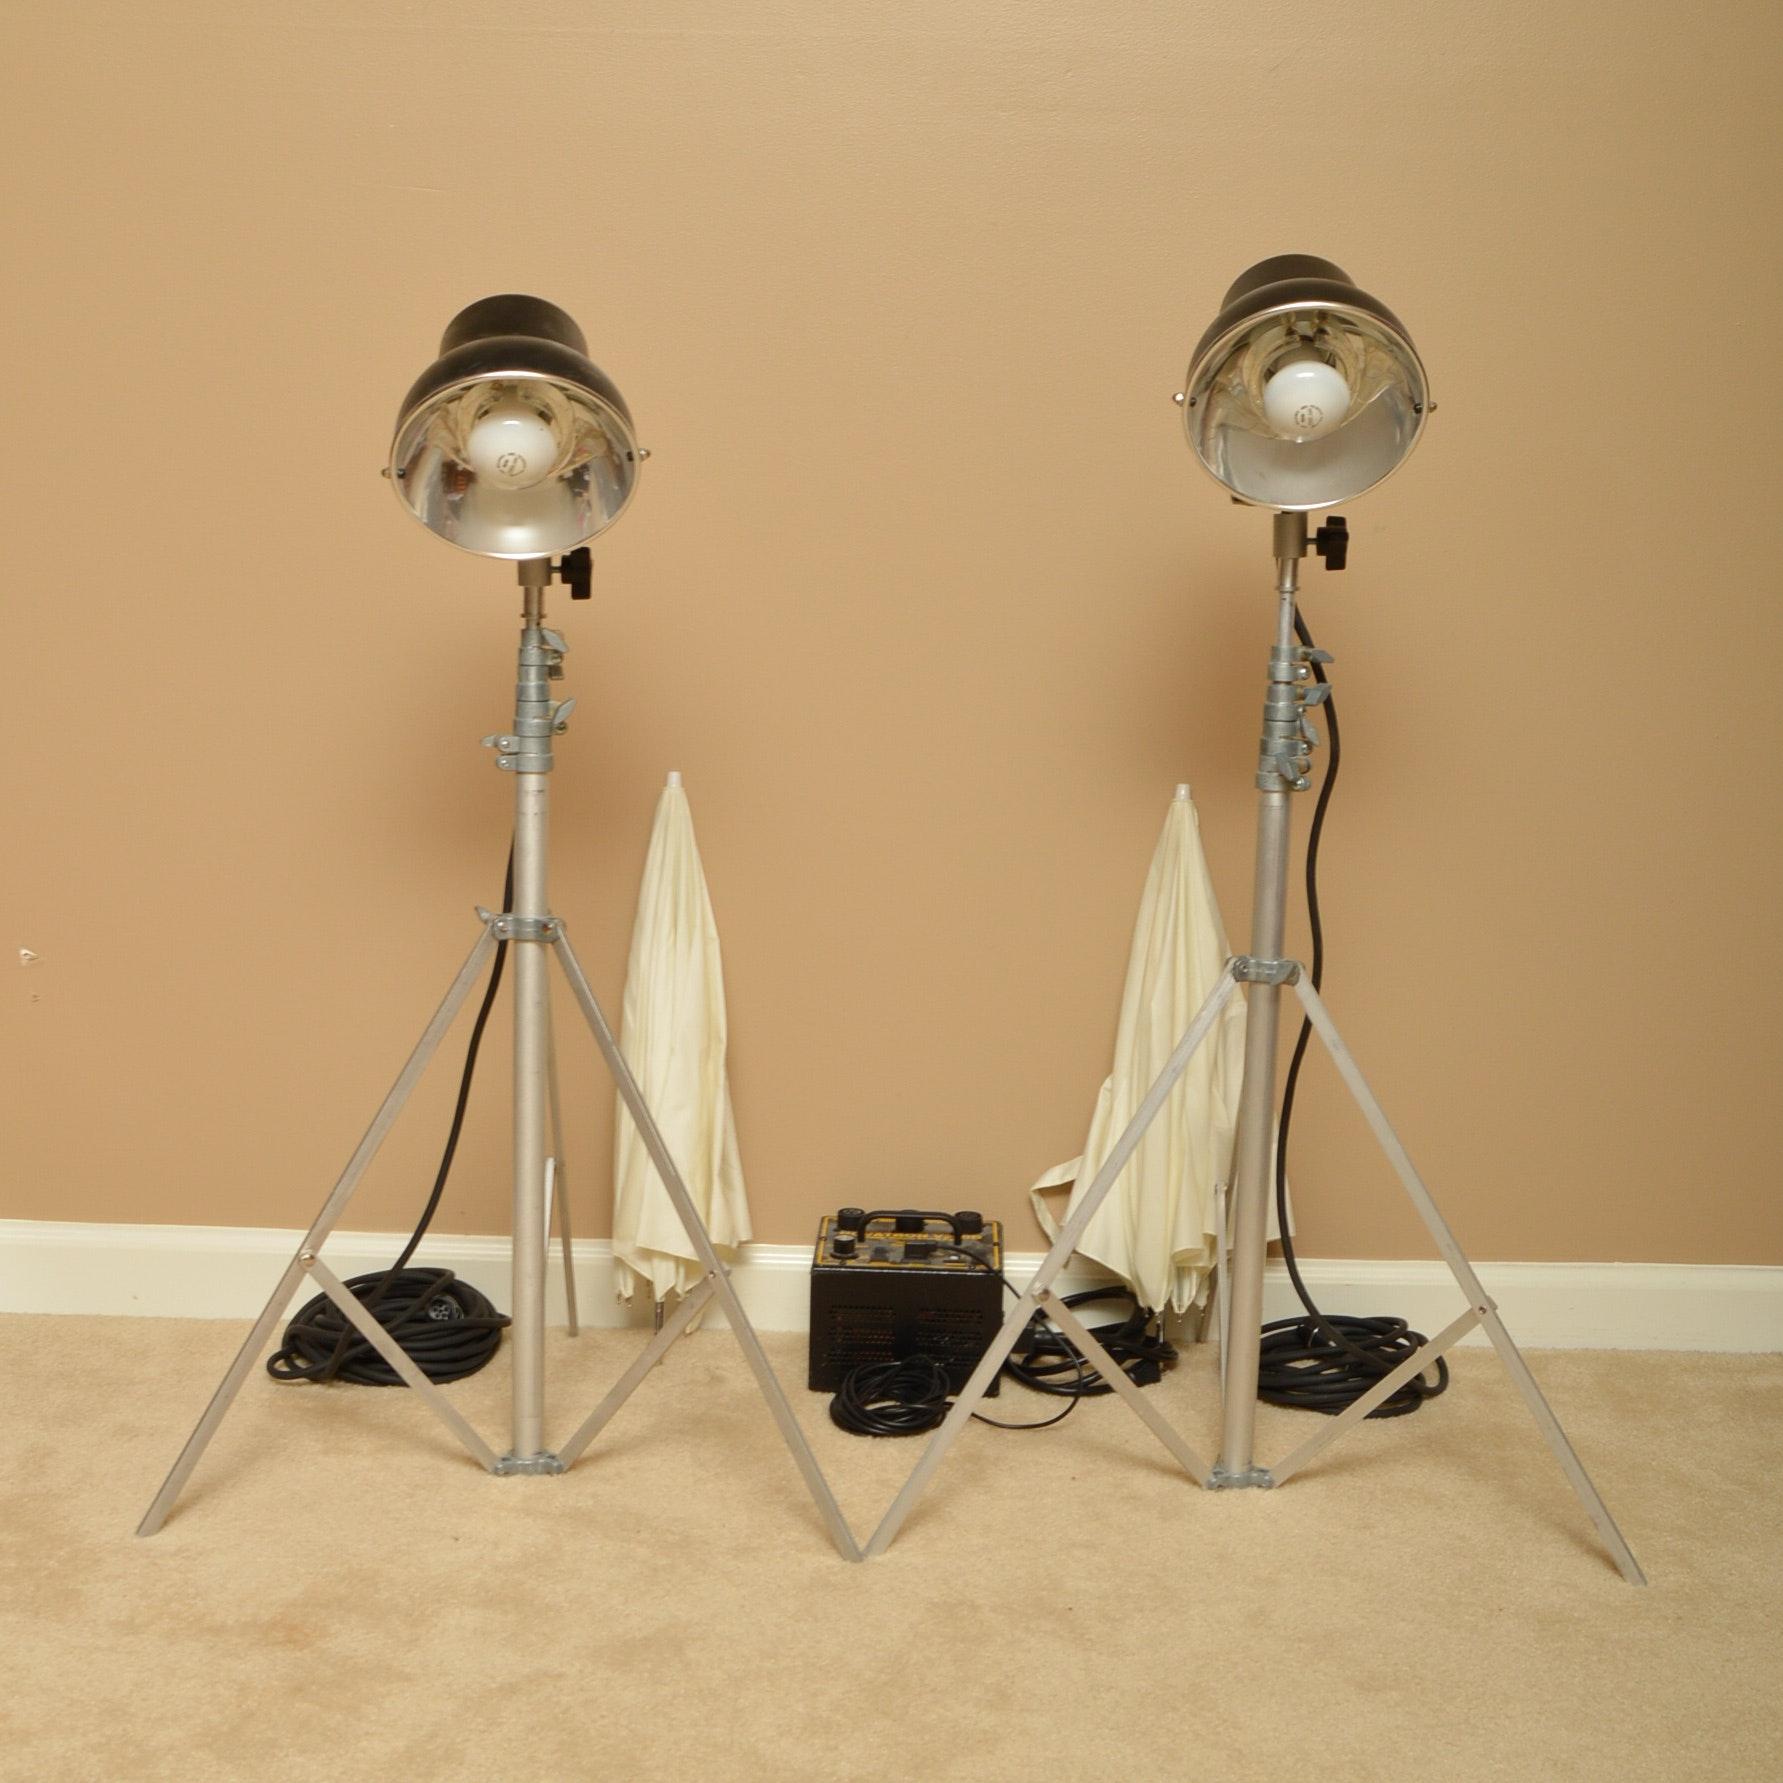 Novatron V240D Lighting Kit ... & Novatron V240D Lighting Kit : EBTH azcodes.com